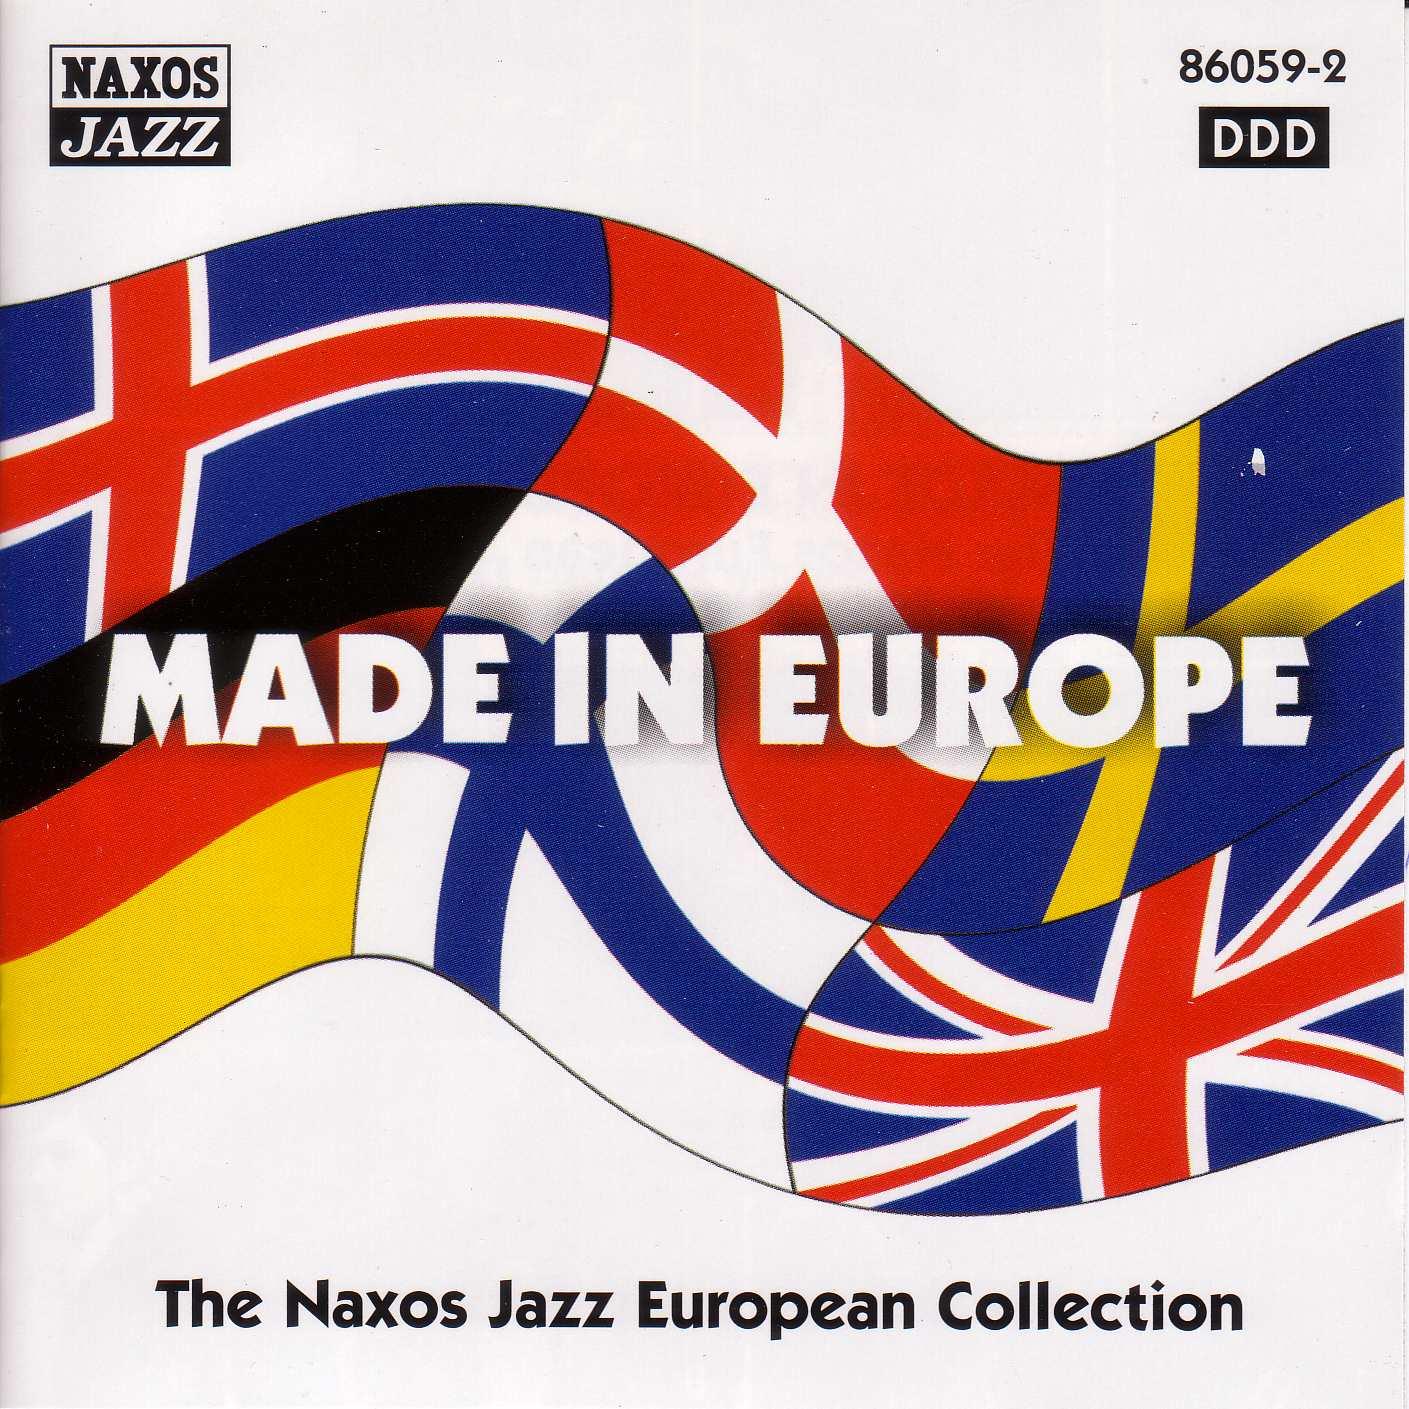 Made in Europe (Naxos Jazz European Collection)